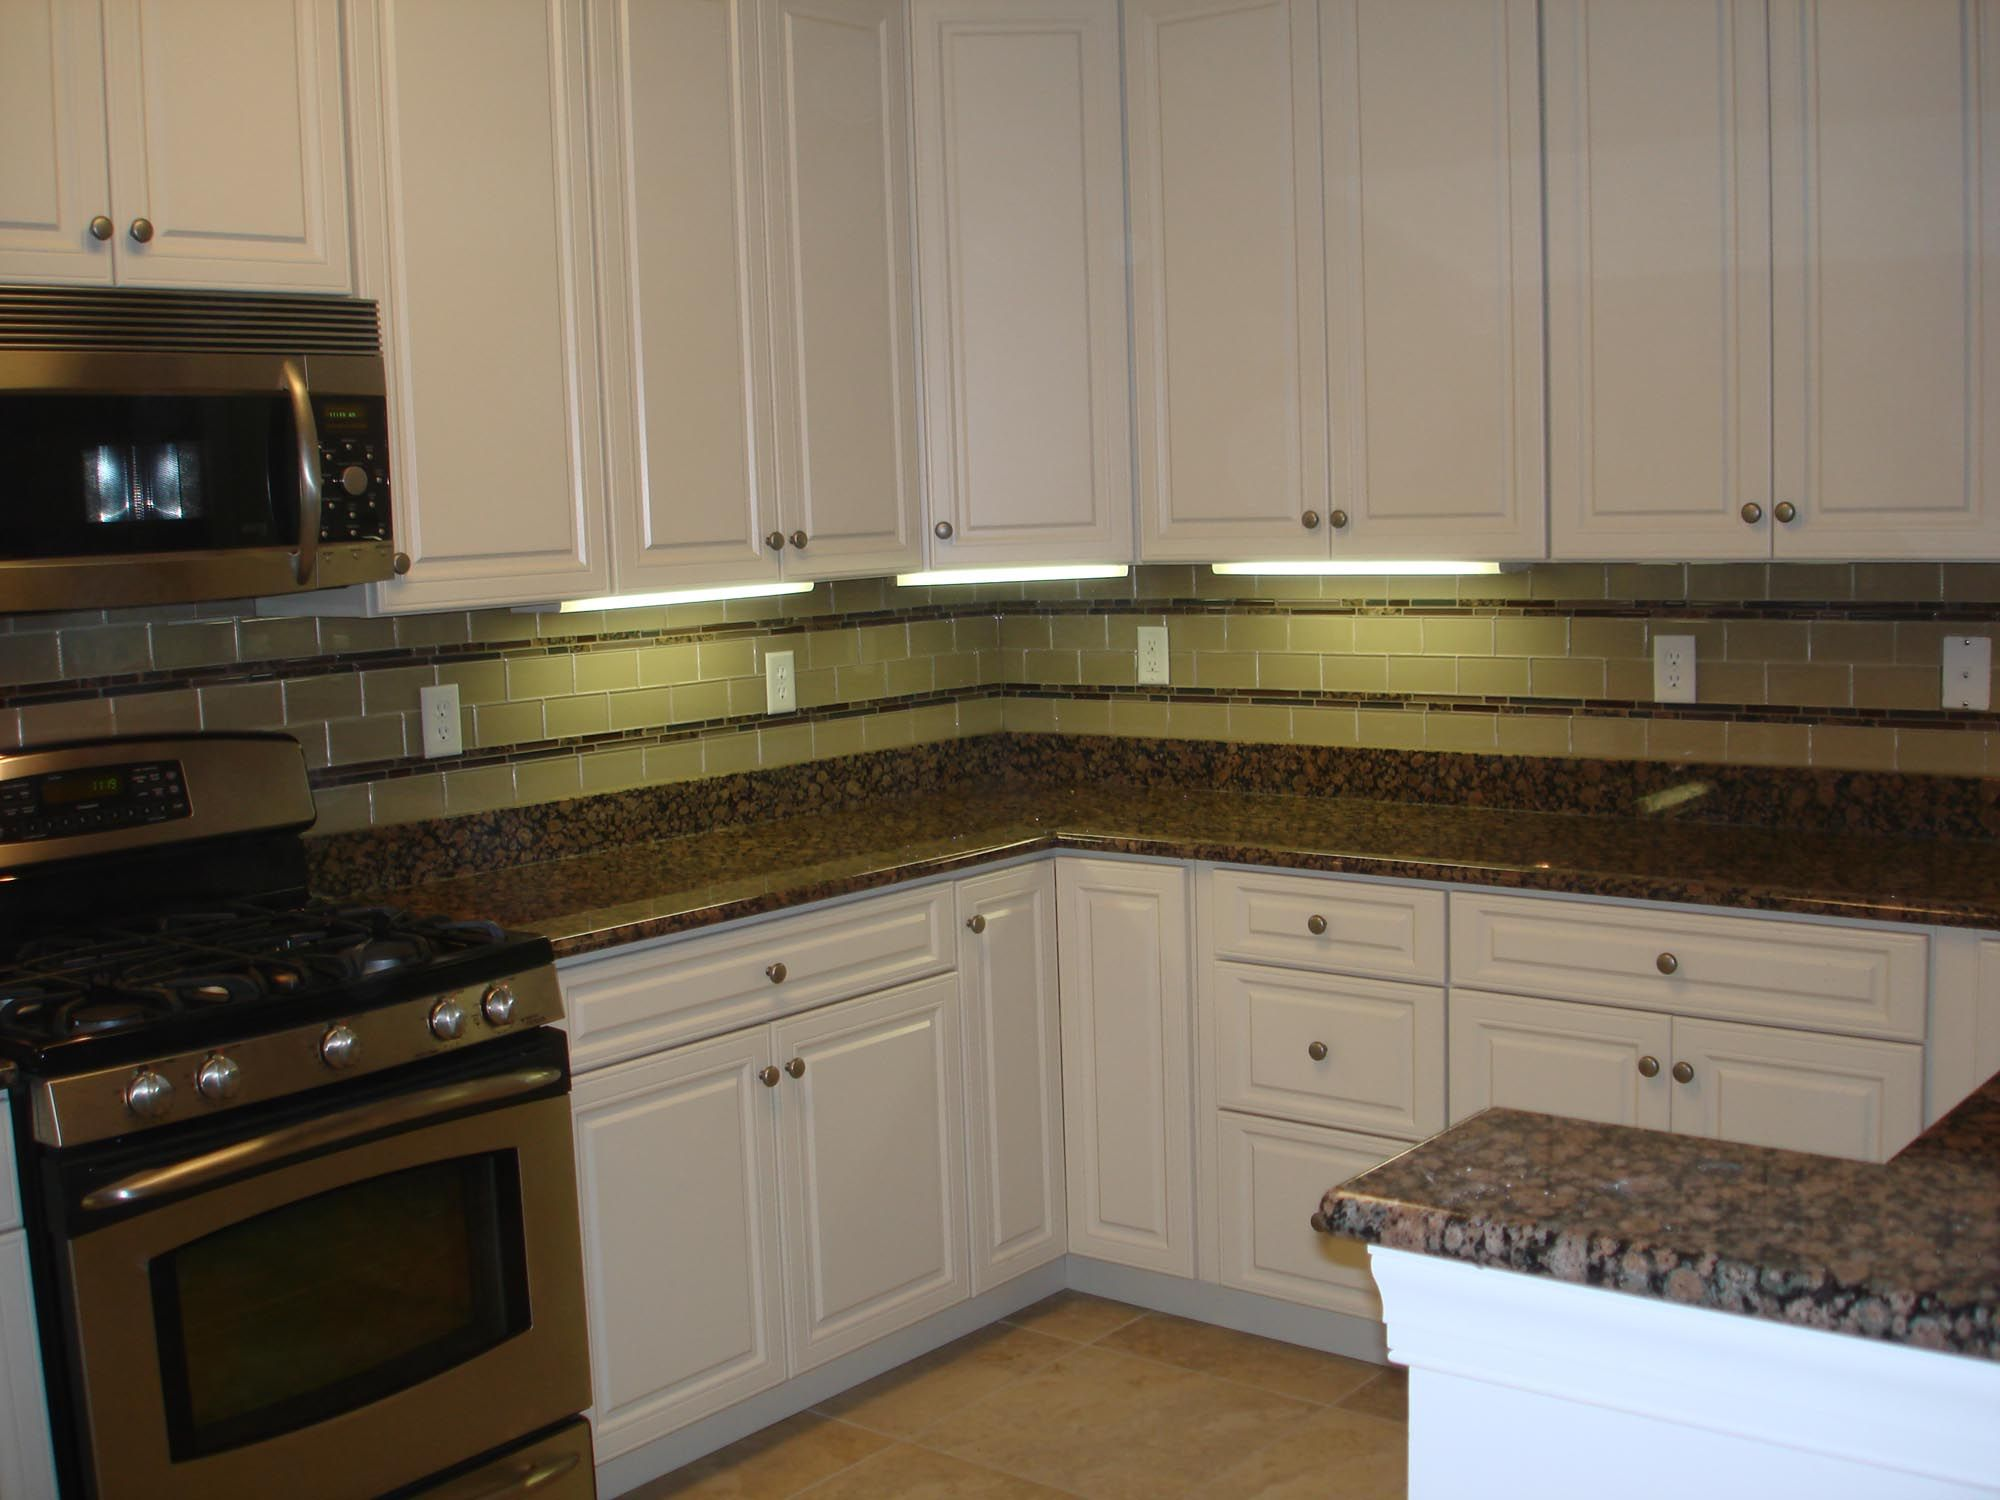 Glass Backsplash In Kitchen 17 Best Images About Back Splash On Pinterest Kitchen Backsplash